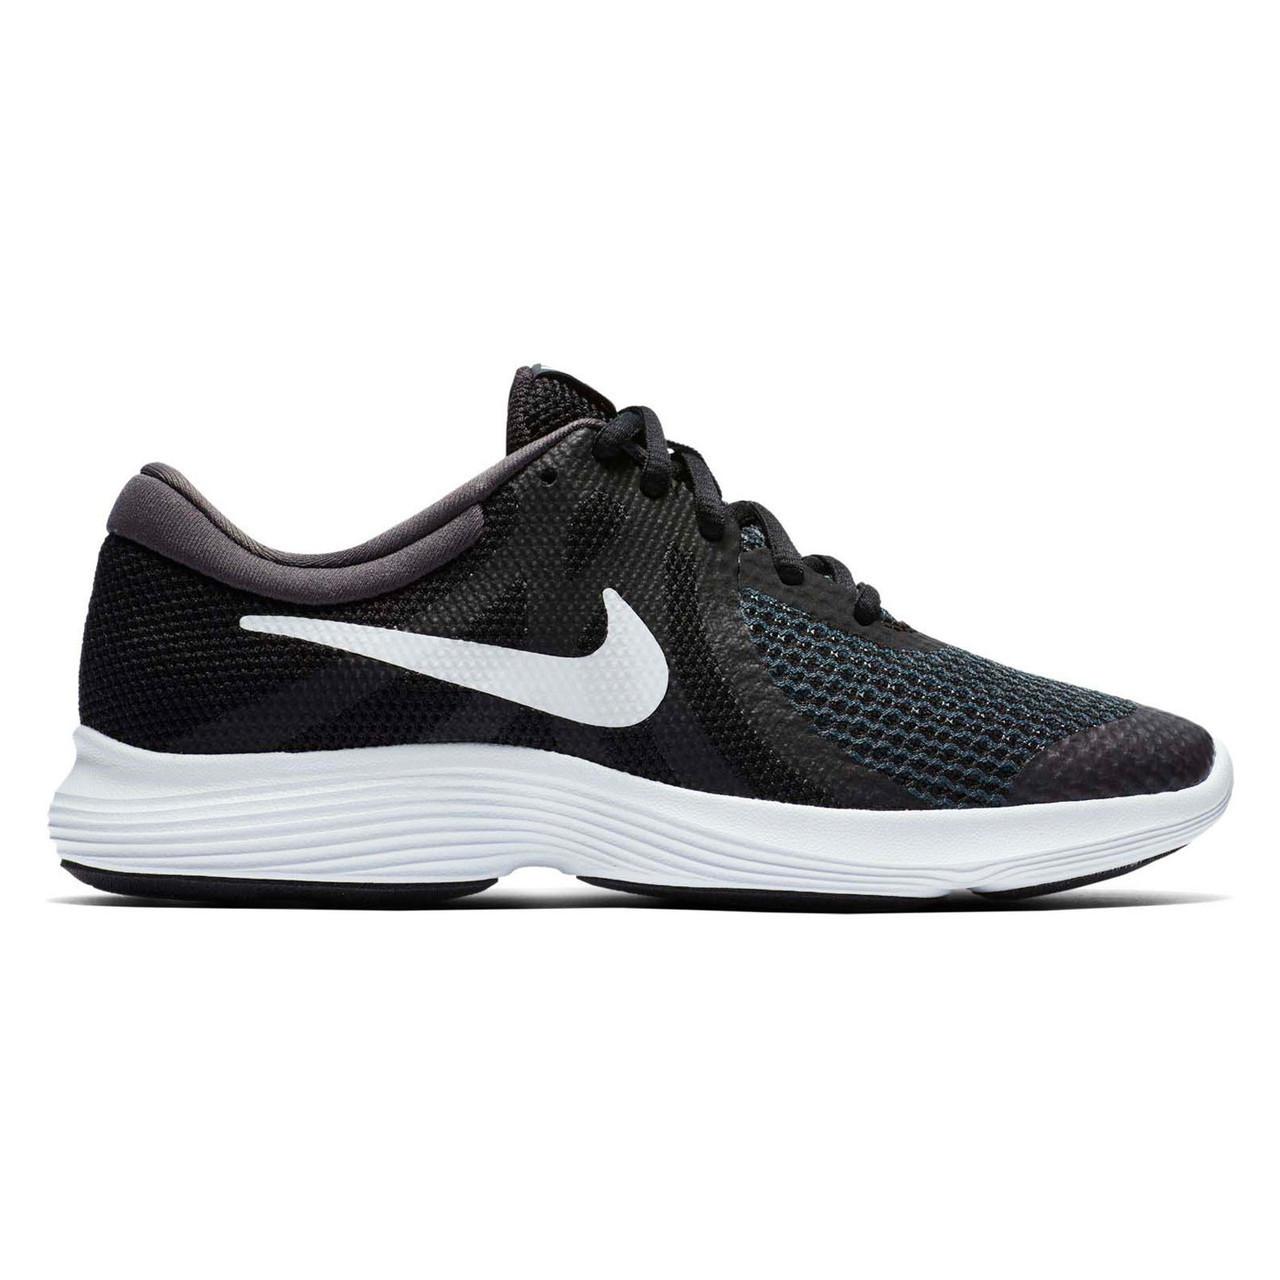 09b867ed Кроссовки Nike детские NIKE REVOLUTION 4 (GS)(03-05-03) 36: продажа ...